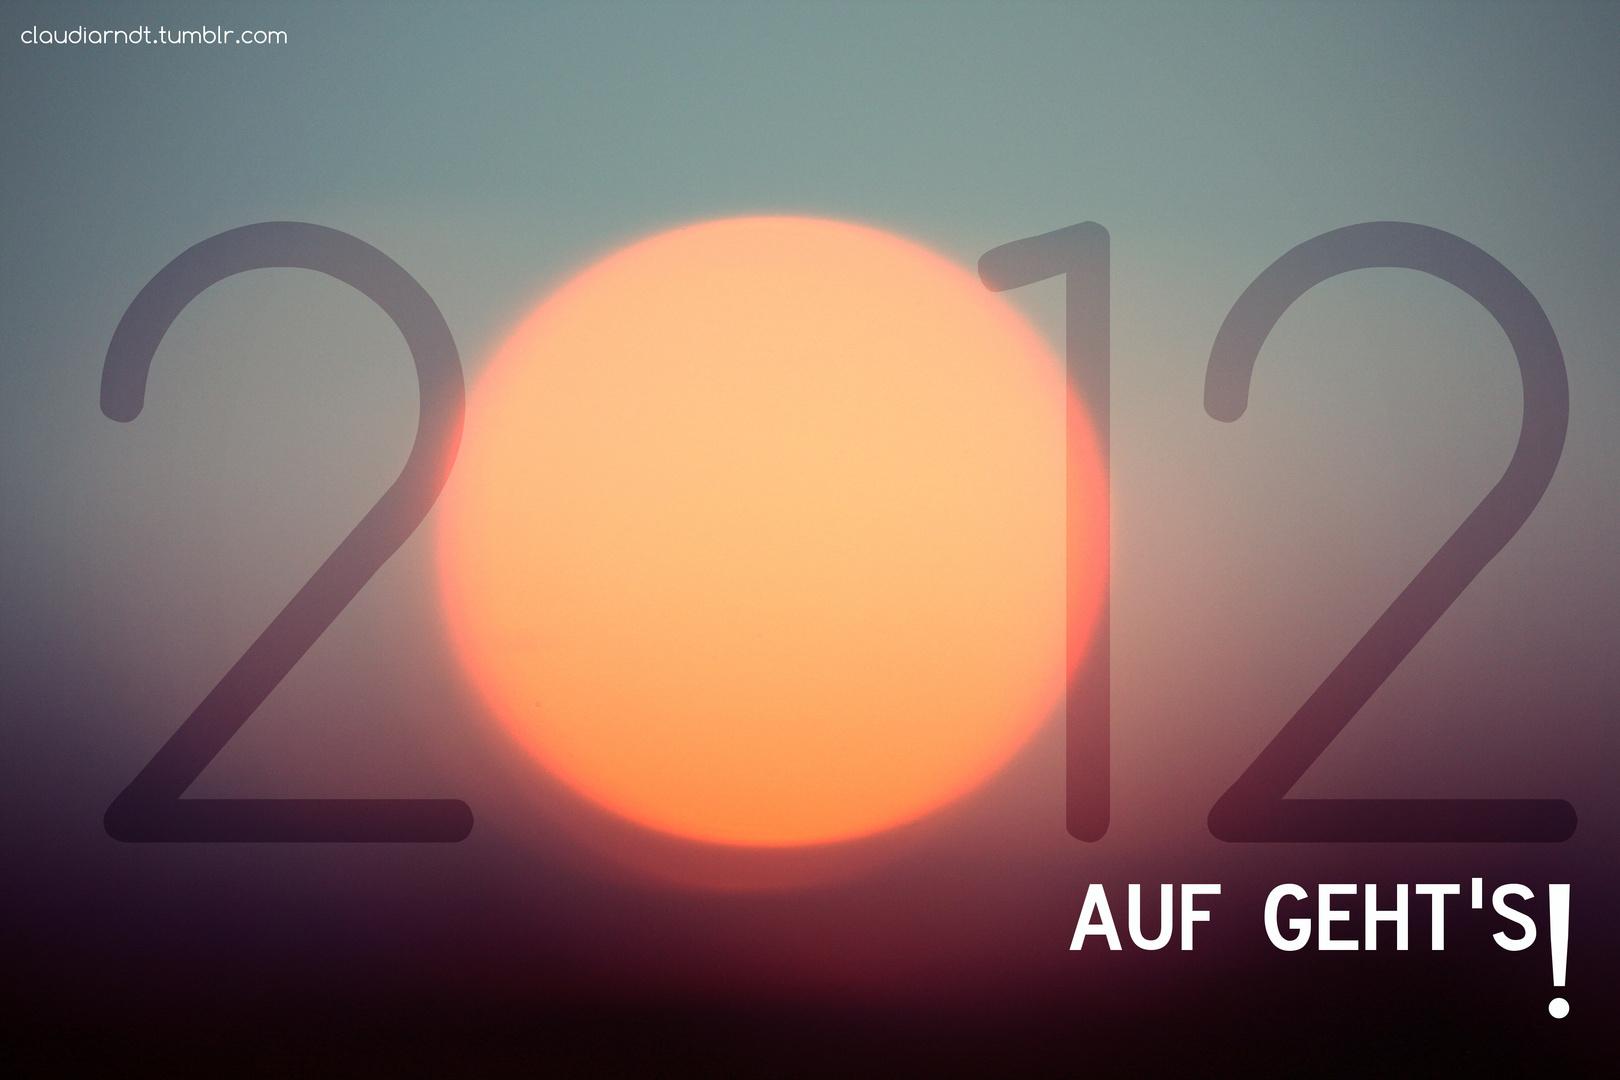 2012!